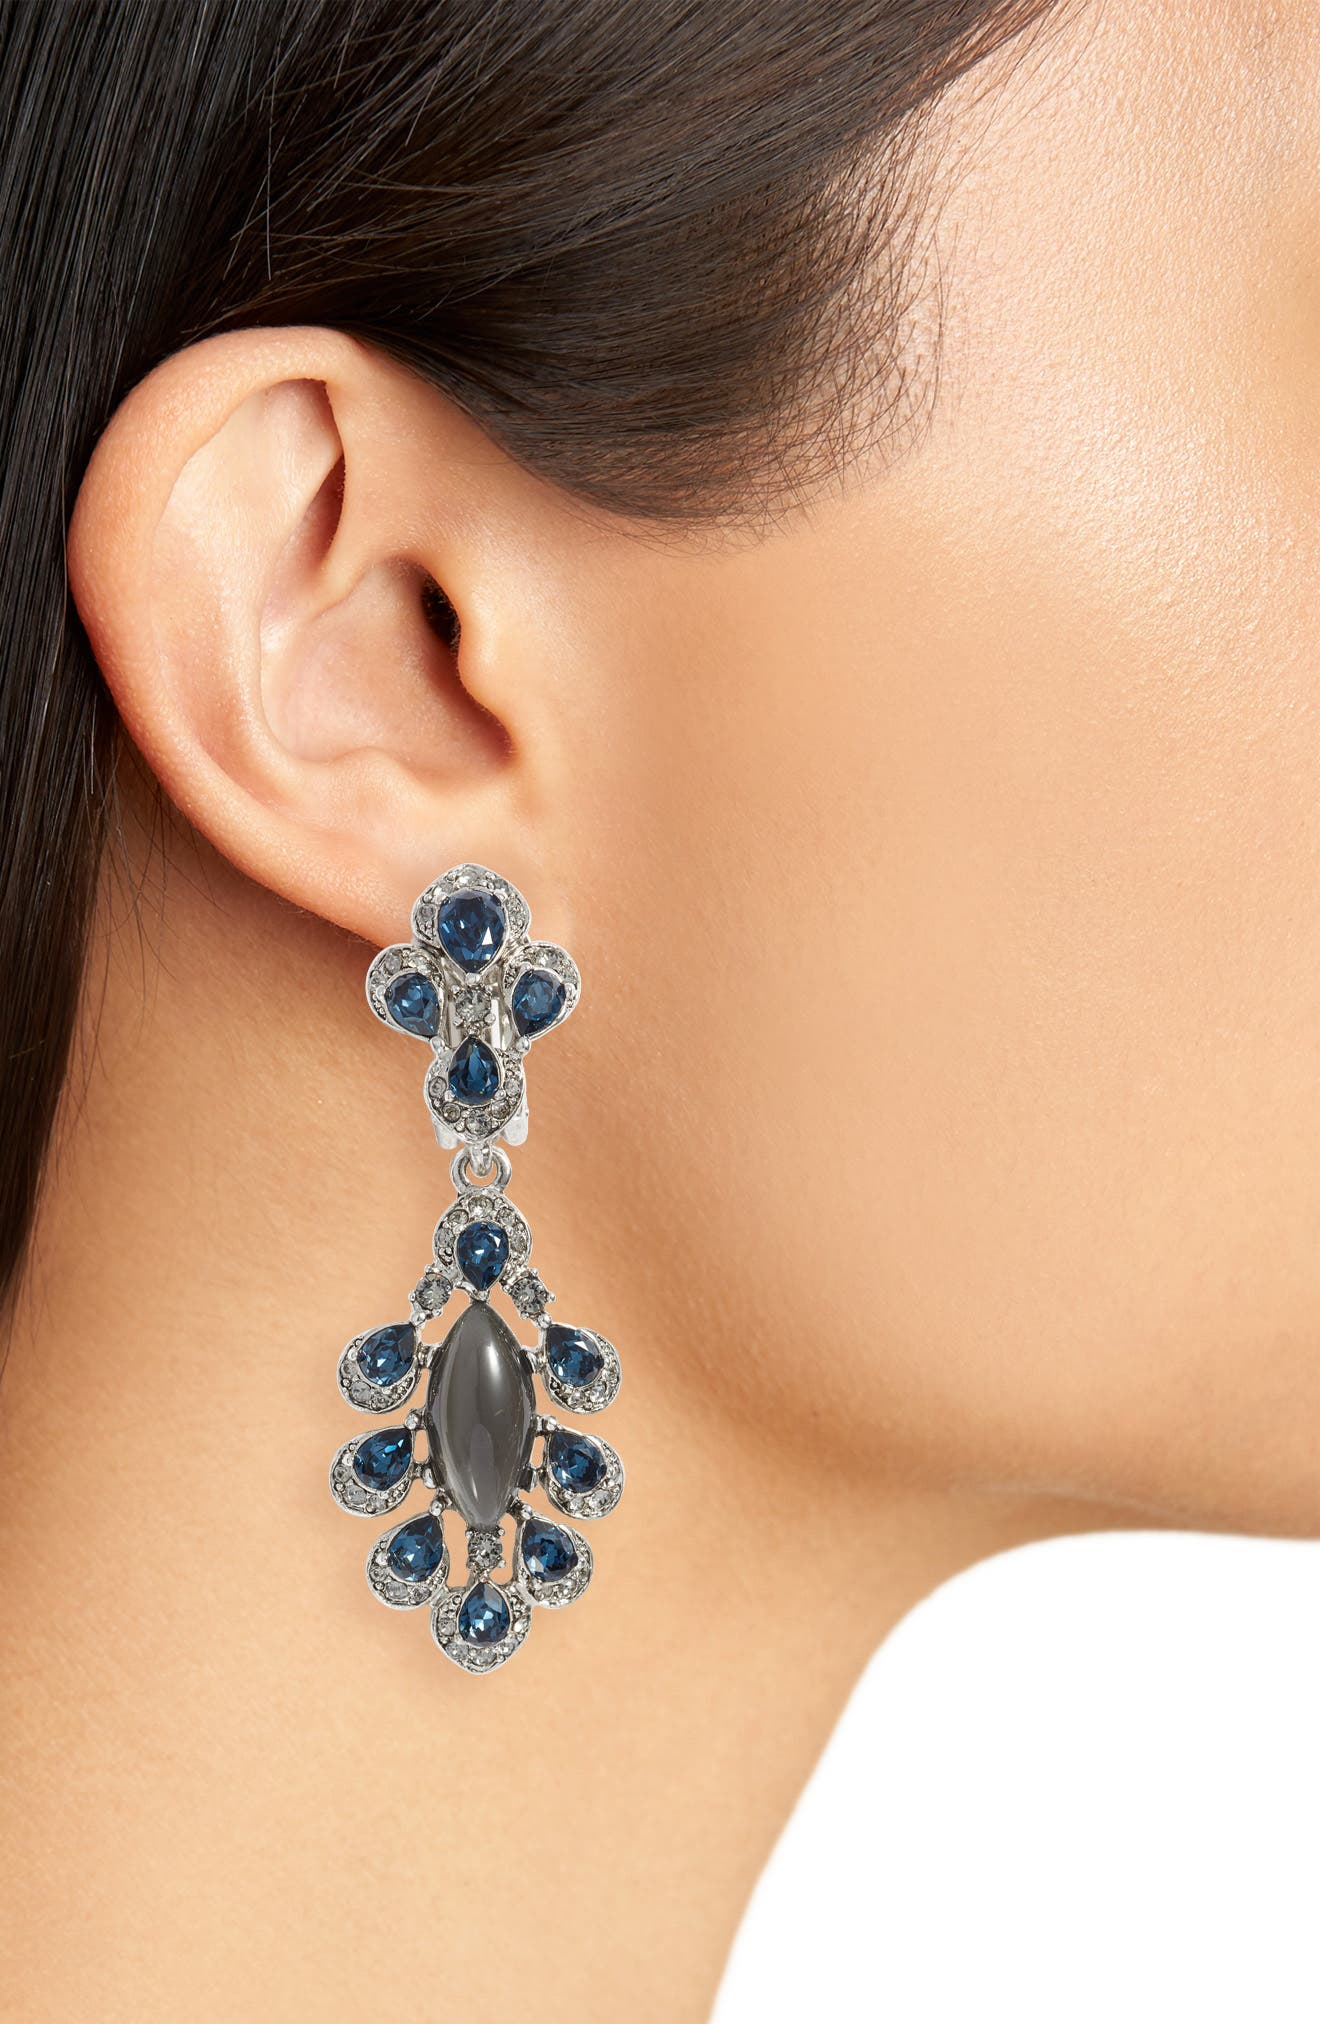 Parlor Crystal Earrings,                             Alternate thumbnail 2, color,                             400